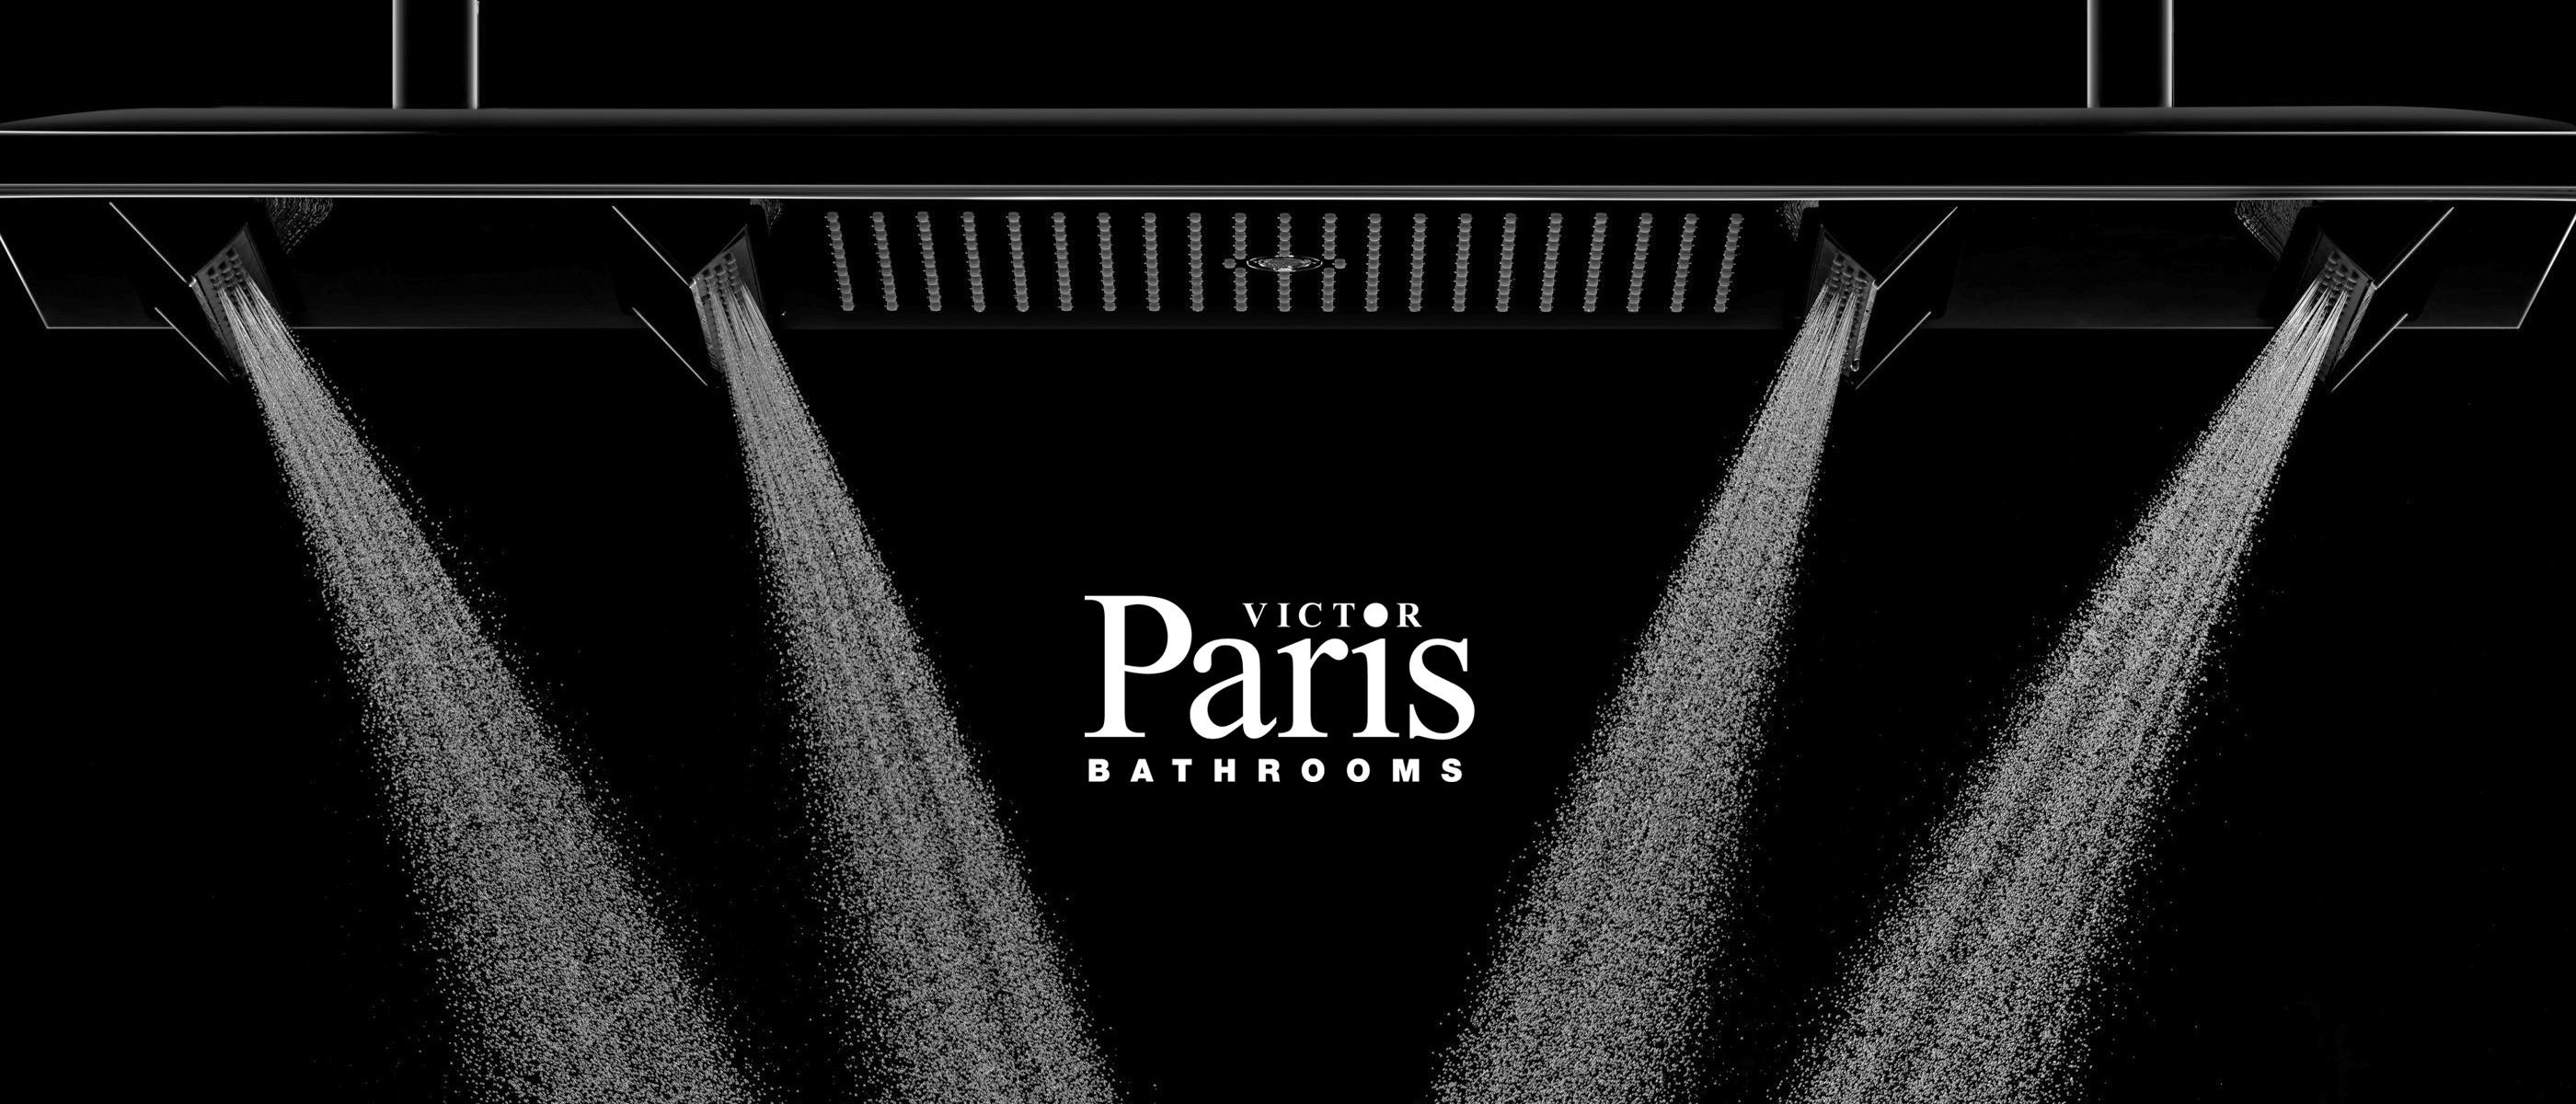 Victor Paris